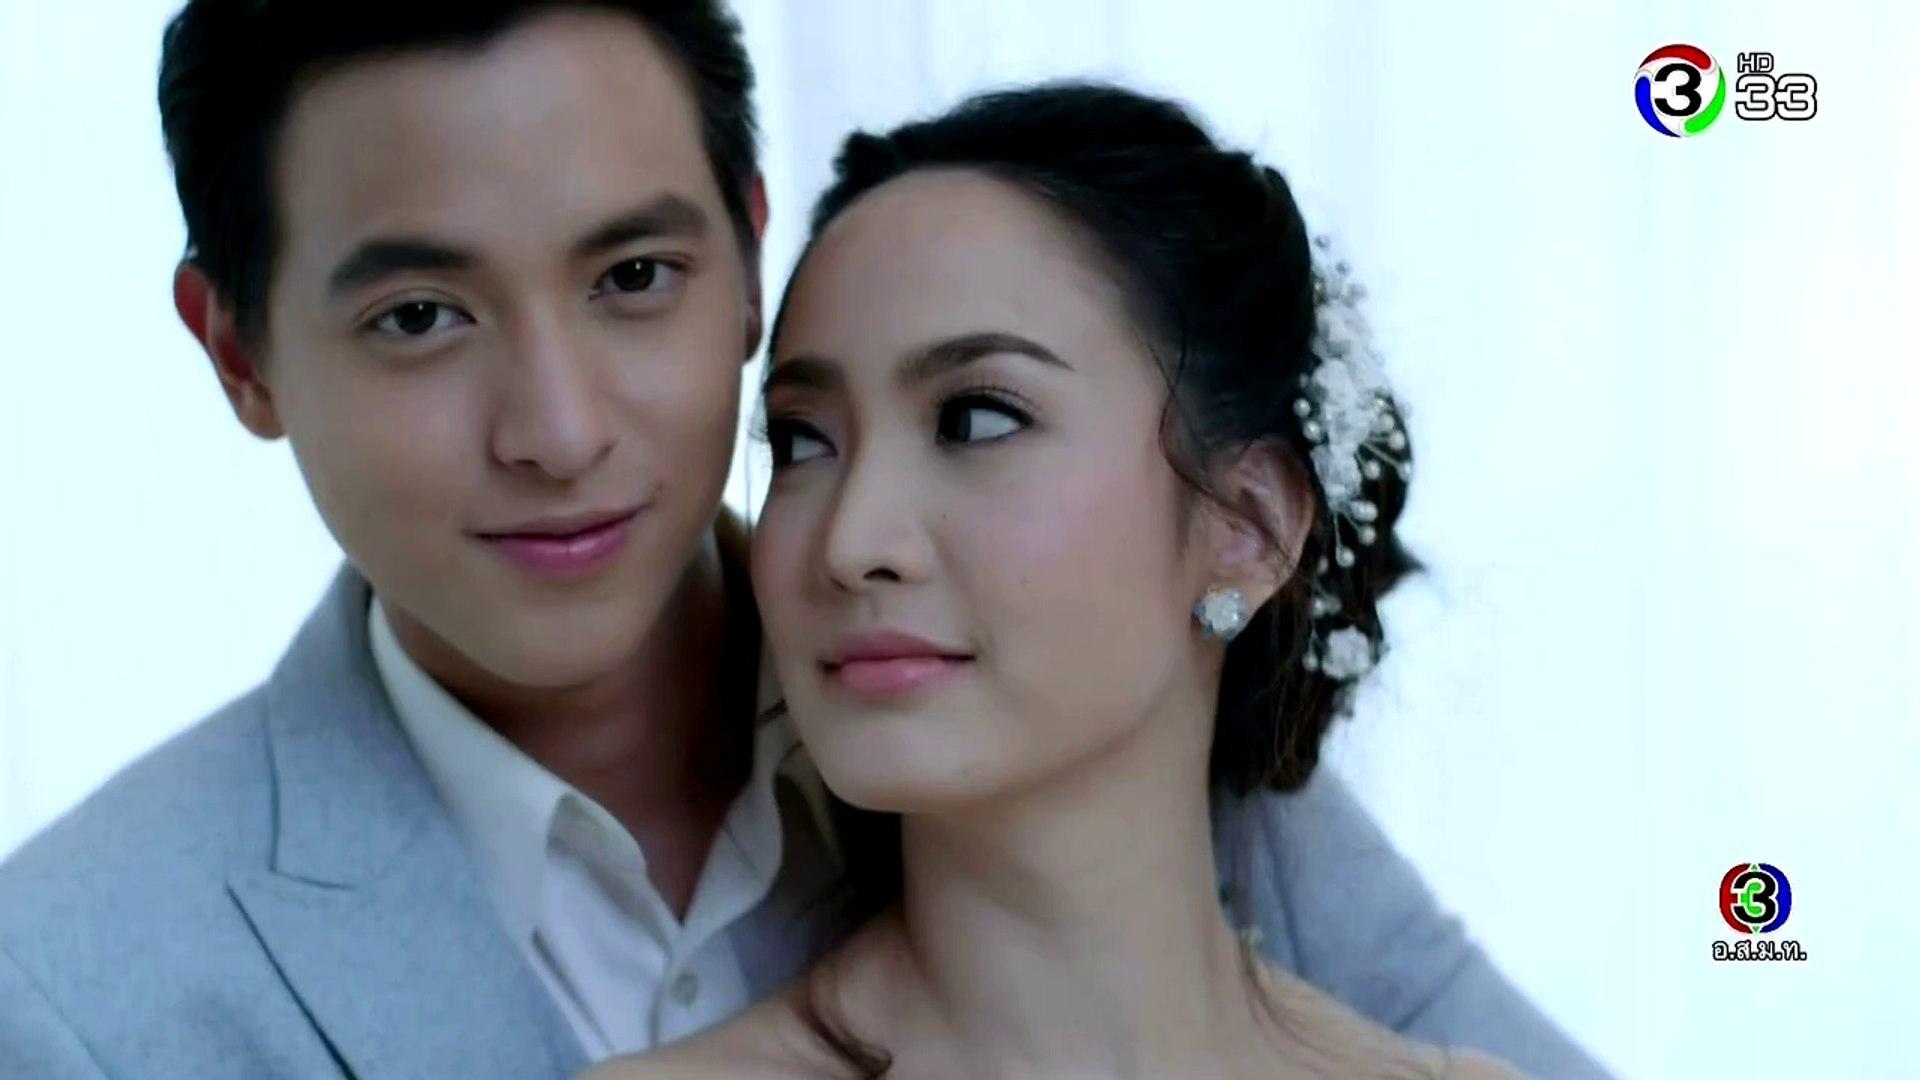 Phim tro choi tinh ai thai lan 2018 thuyet minh